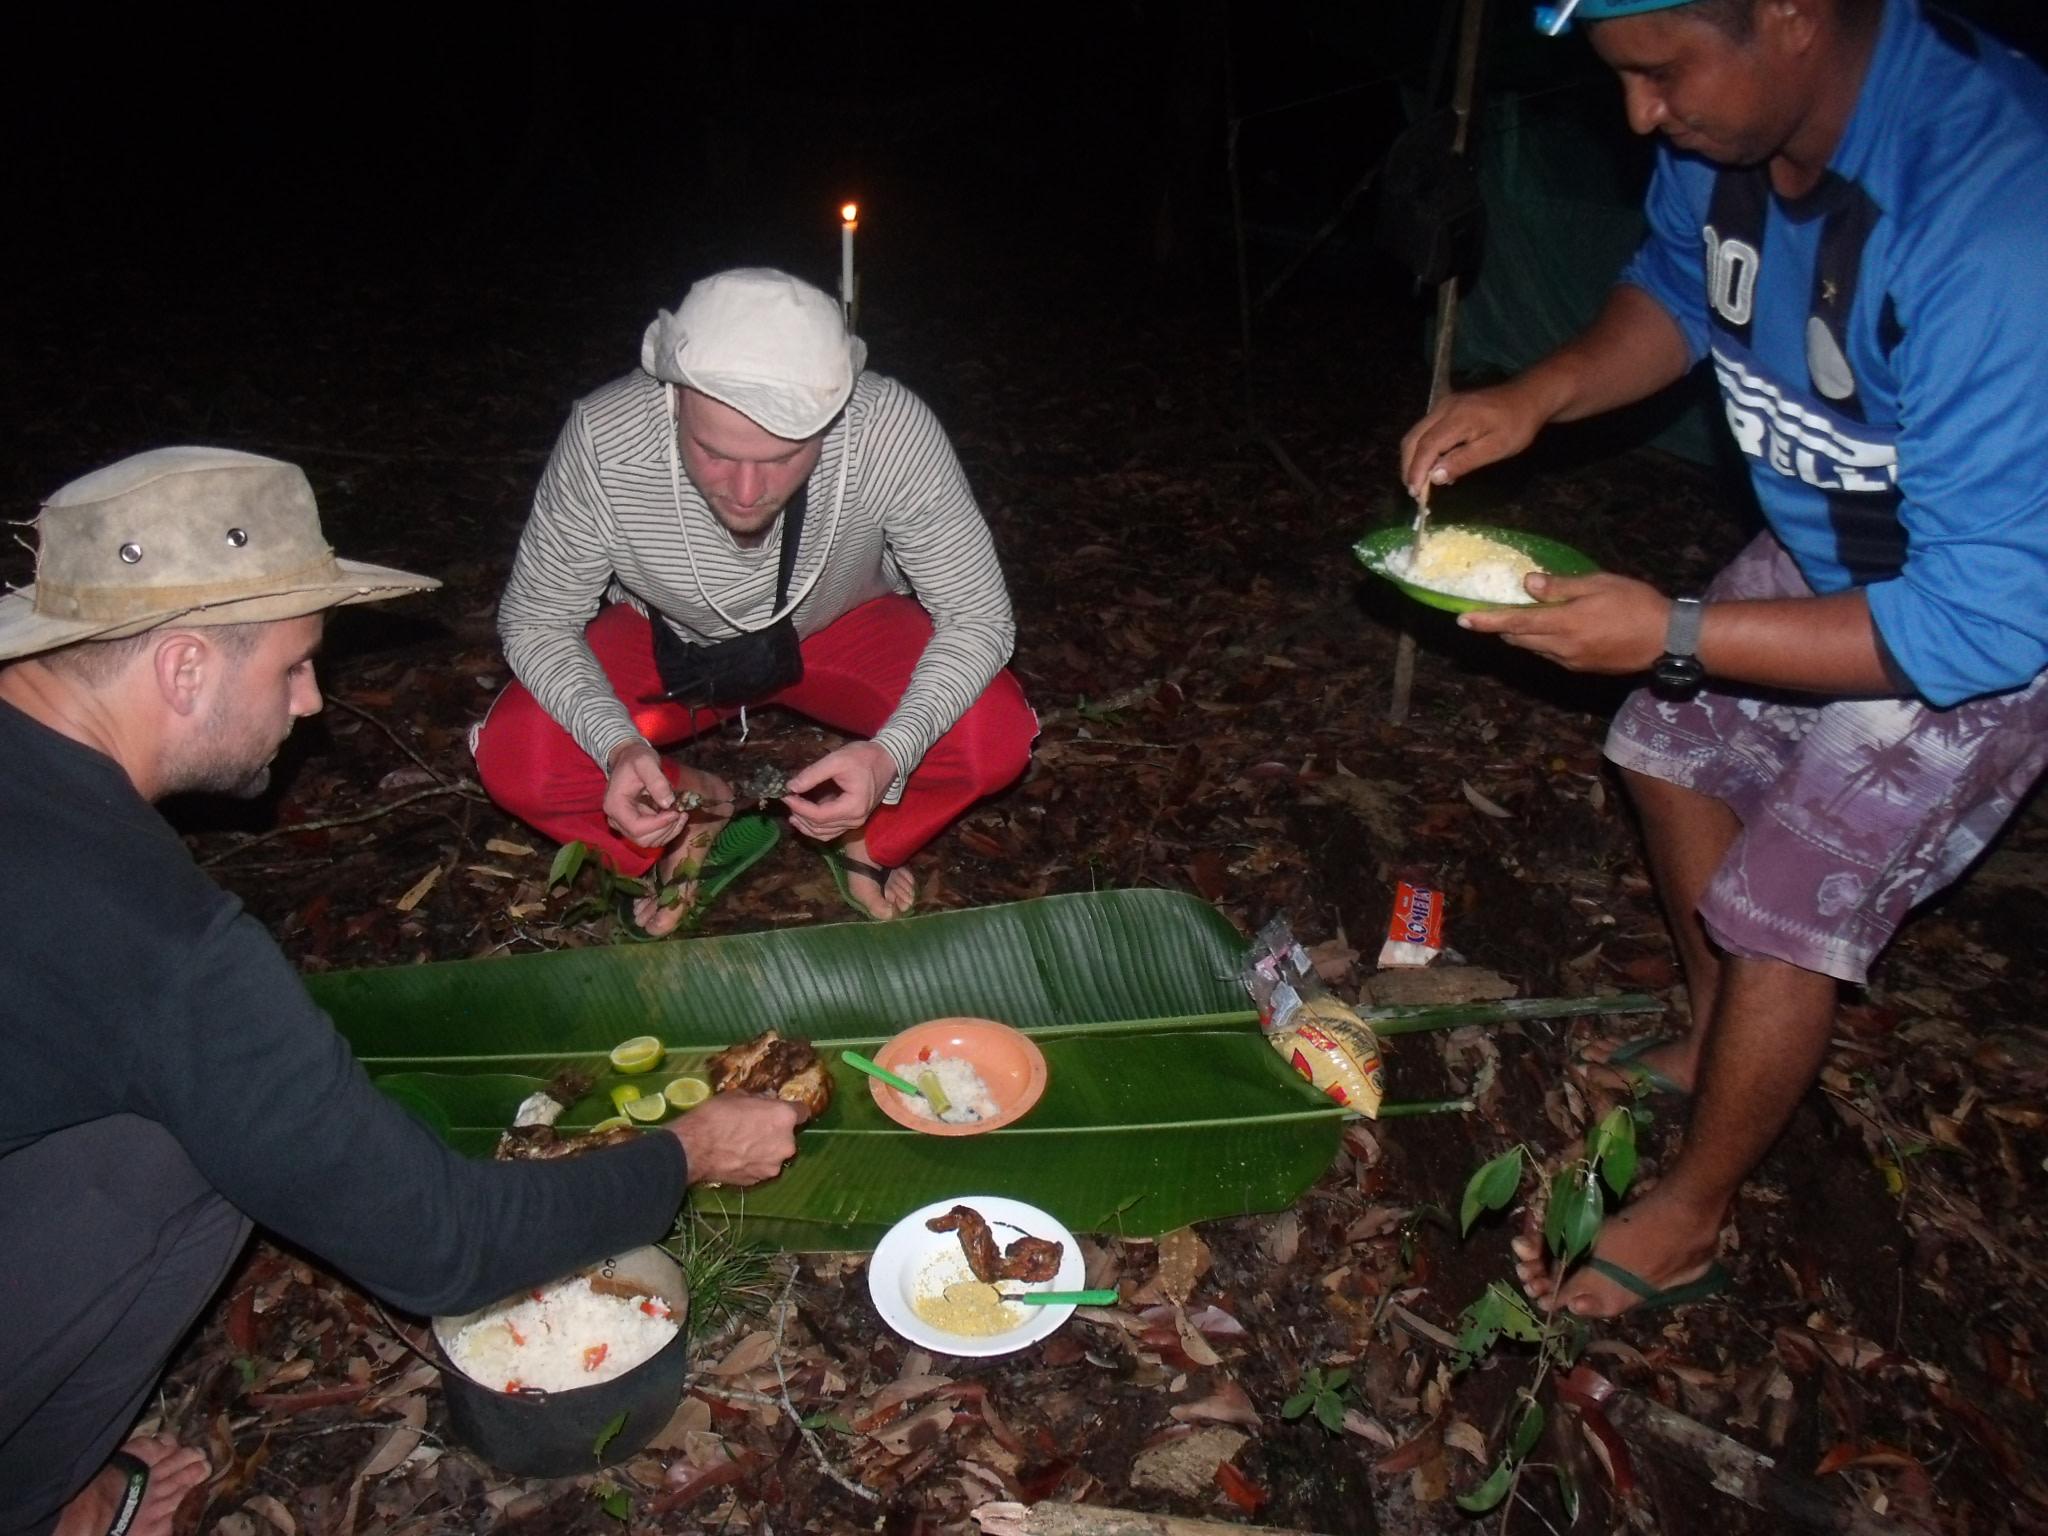 Having dinner in Amazon